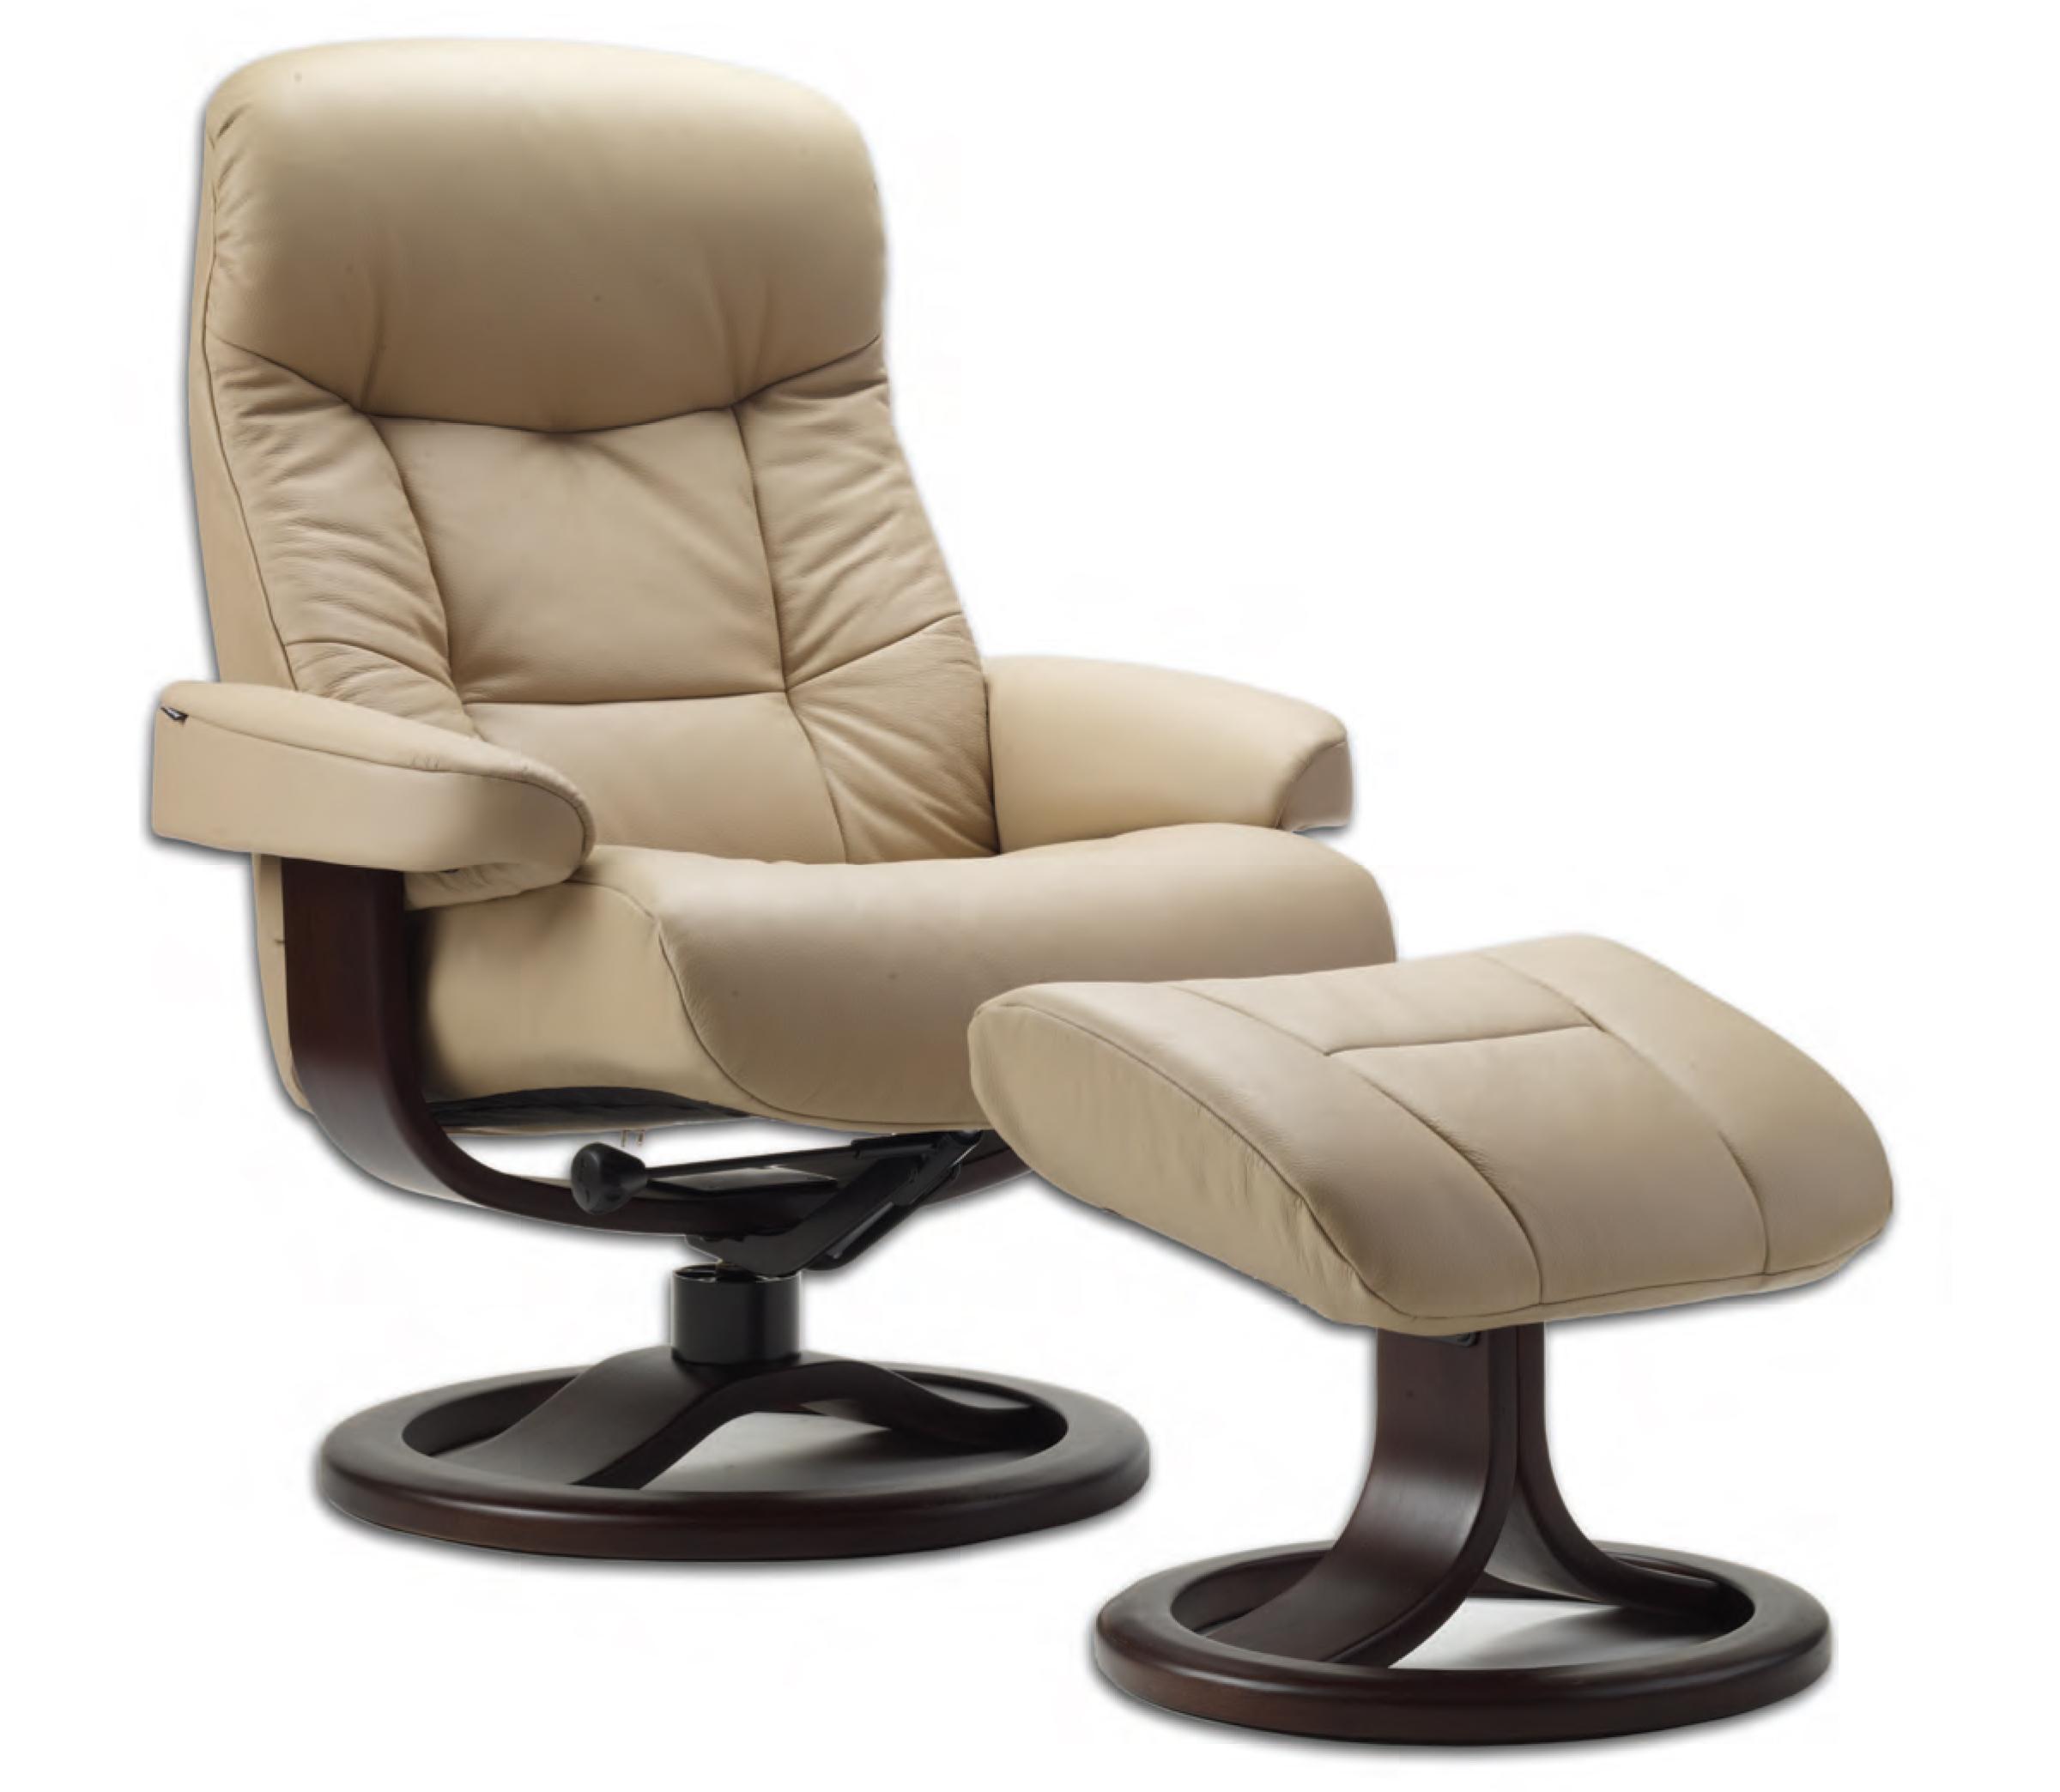 Superb Fjords 215 Muldal Ergonomic Leather Recliner Chair Ottoman Scandinavian Norwegian Lounge Chair By Hjellegjerde Theyellowbook Wood Chair Design Ideas Theyellowbookinfo